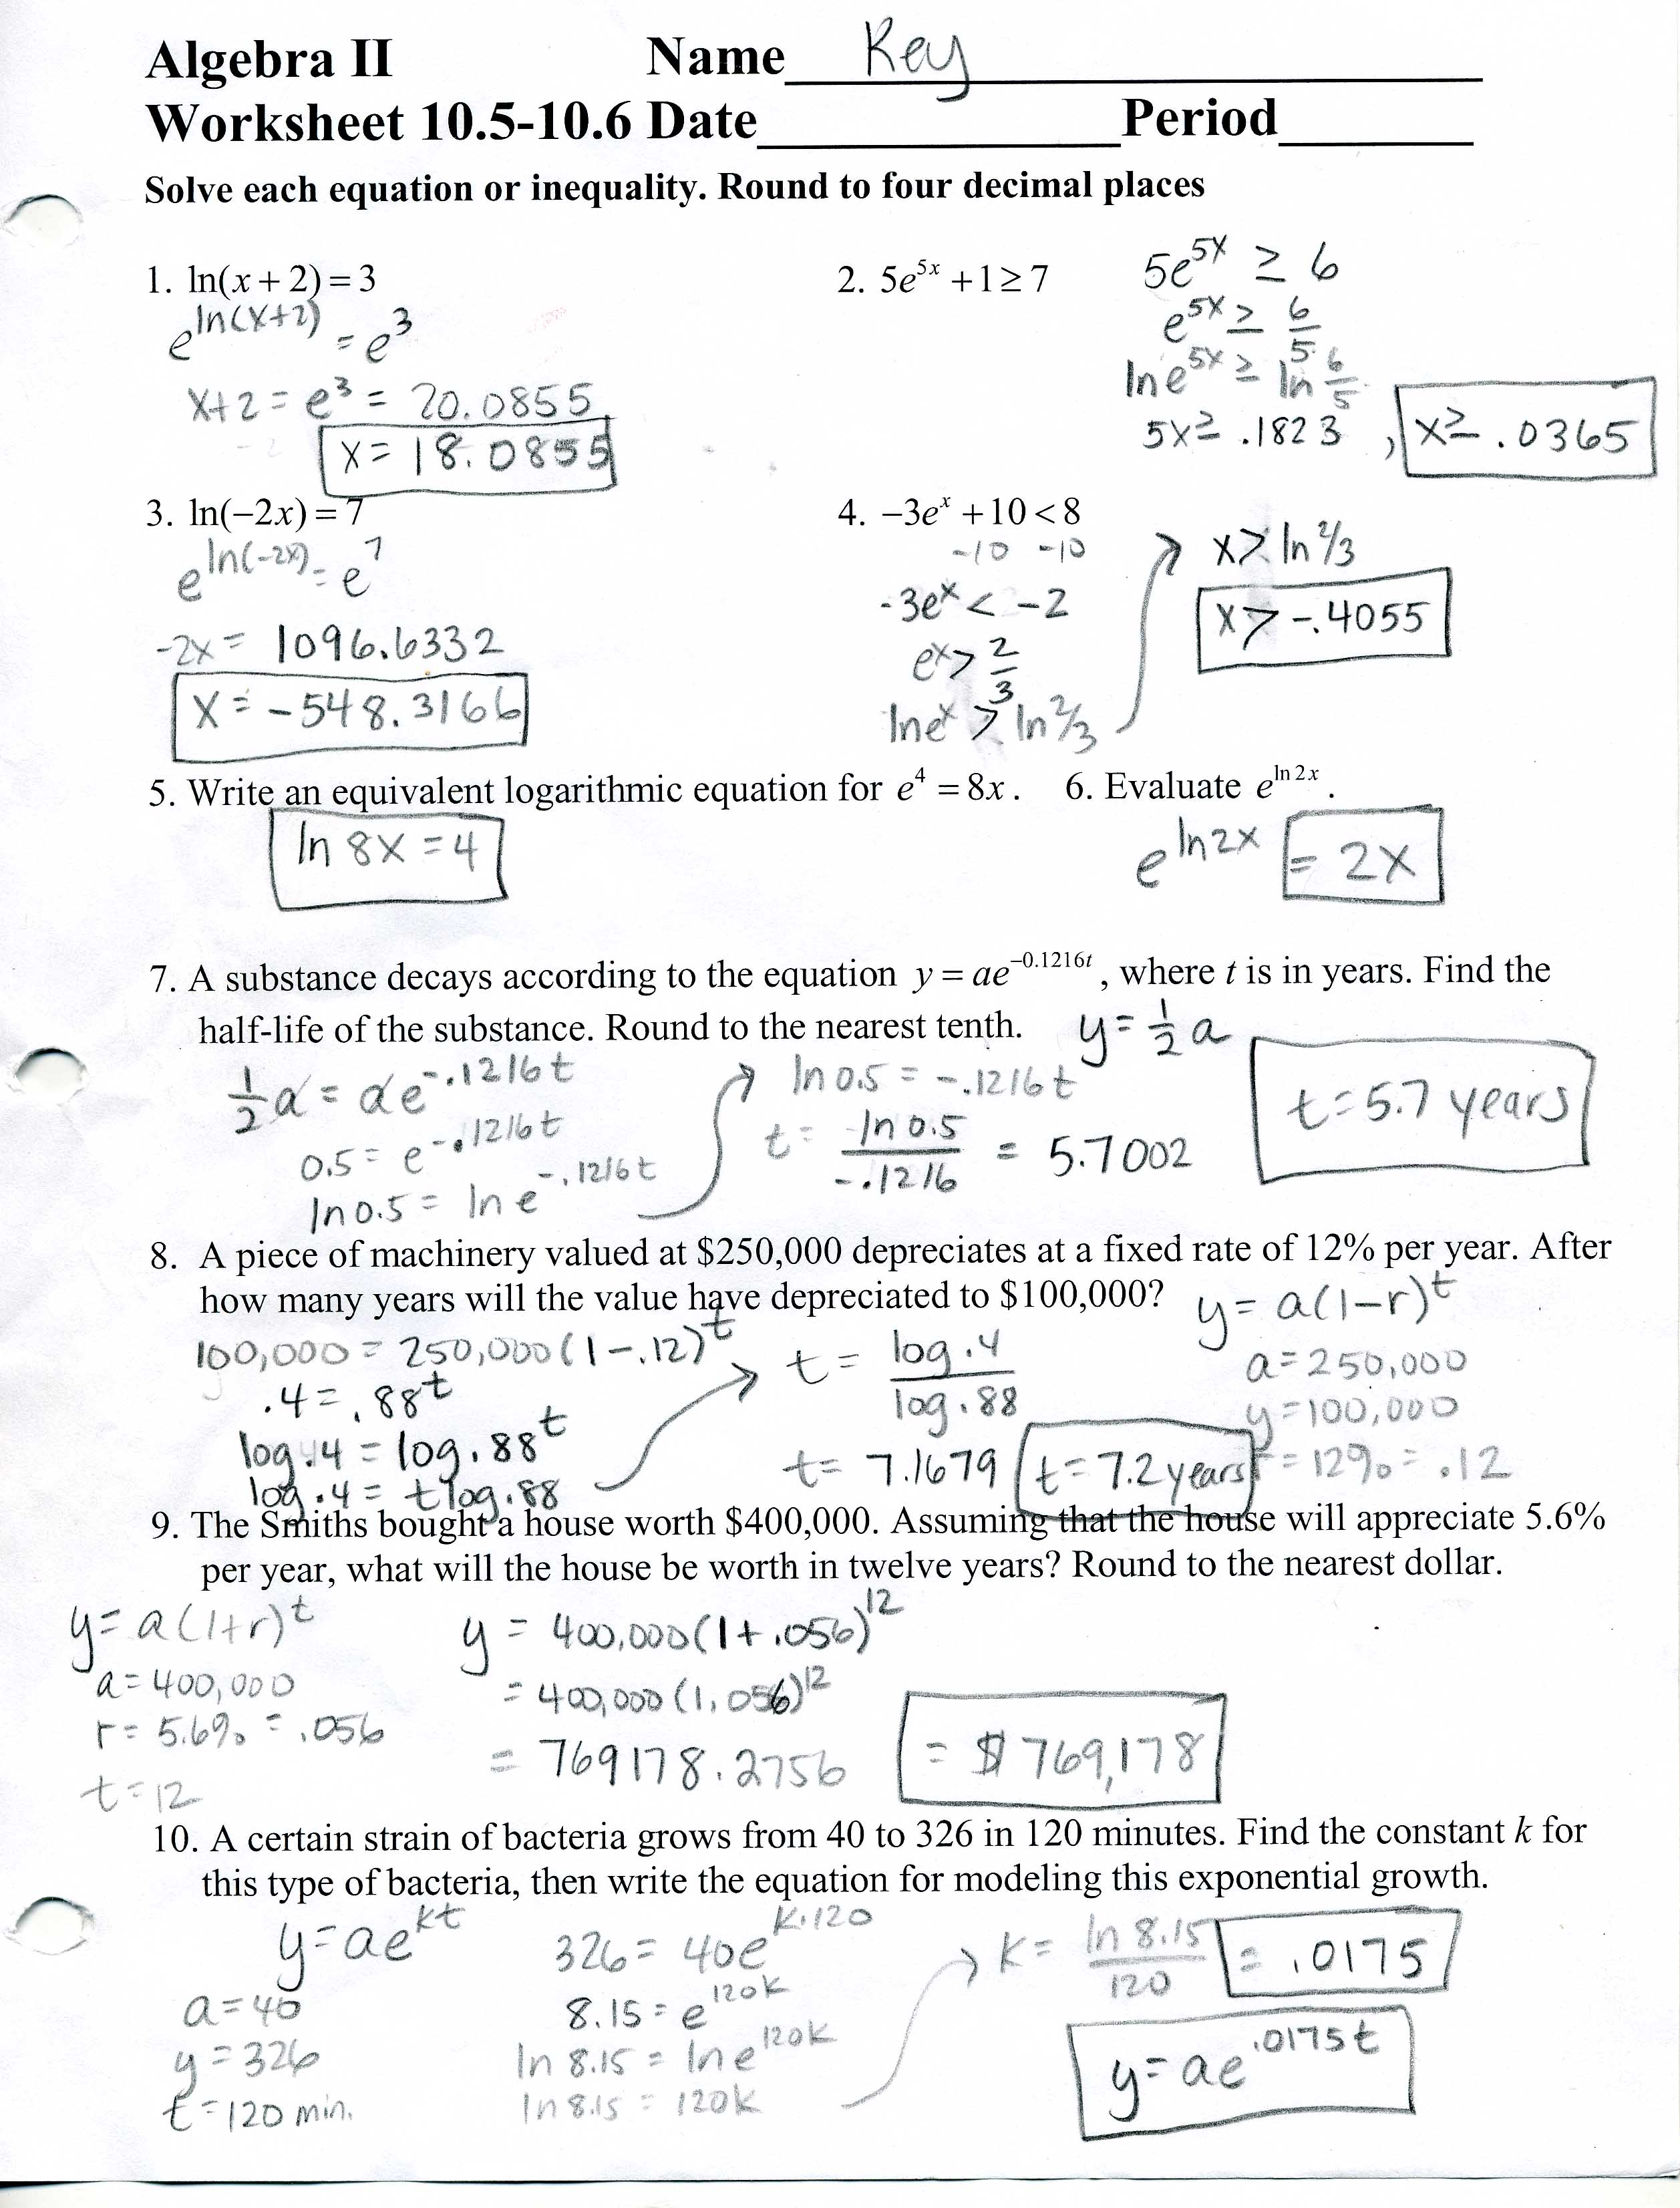 Pearson Algebra 2 Worksheet Answers - Worksheets for Kids ...